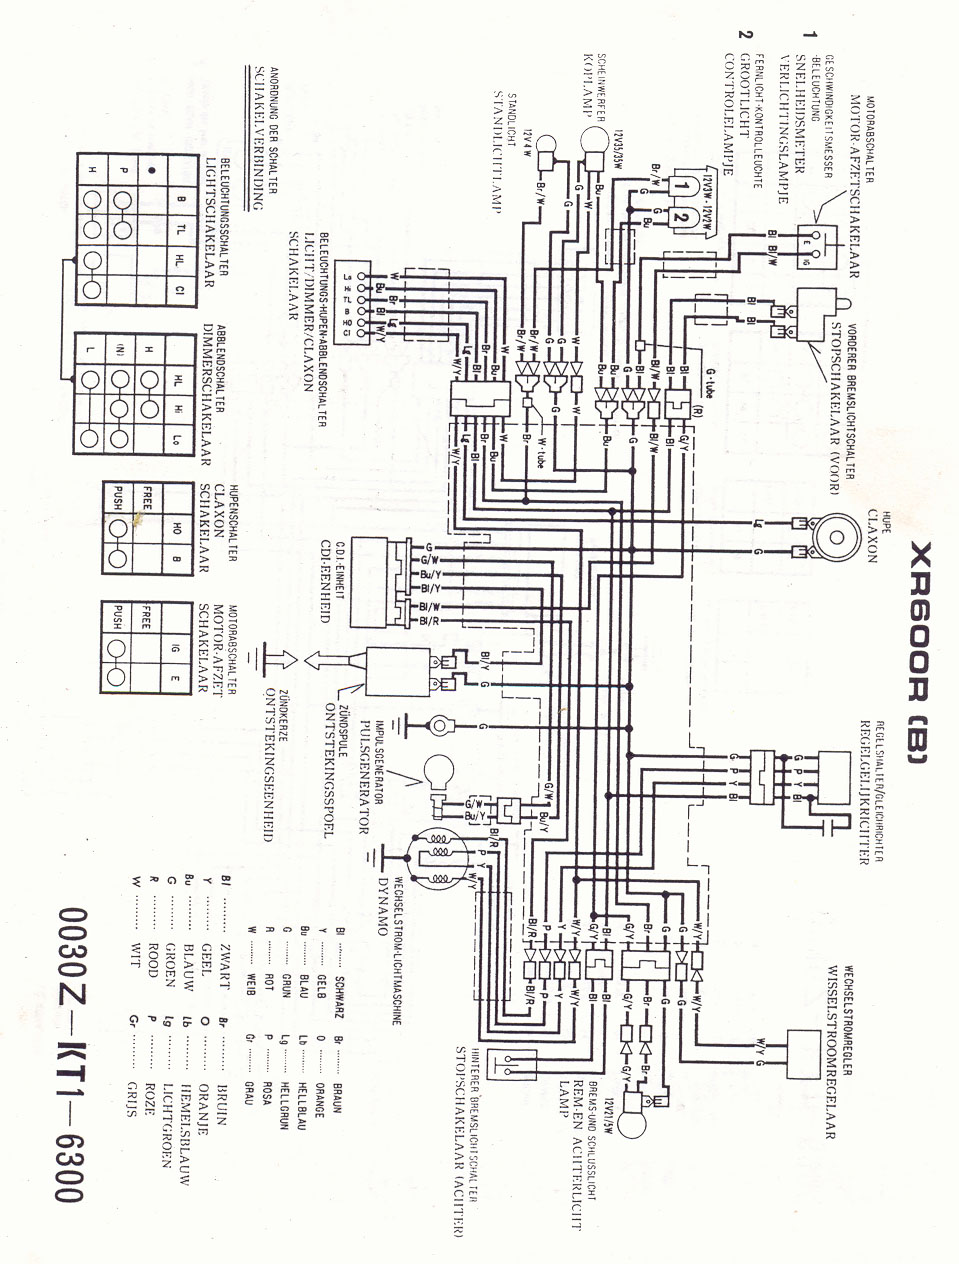 medium resolution of xl600r wiring diagram wiring diagram 1986 honda xl600r wiring diagram honda xl600r wiring diagram